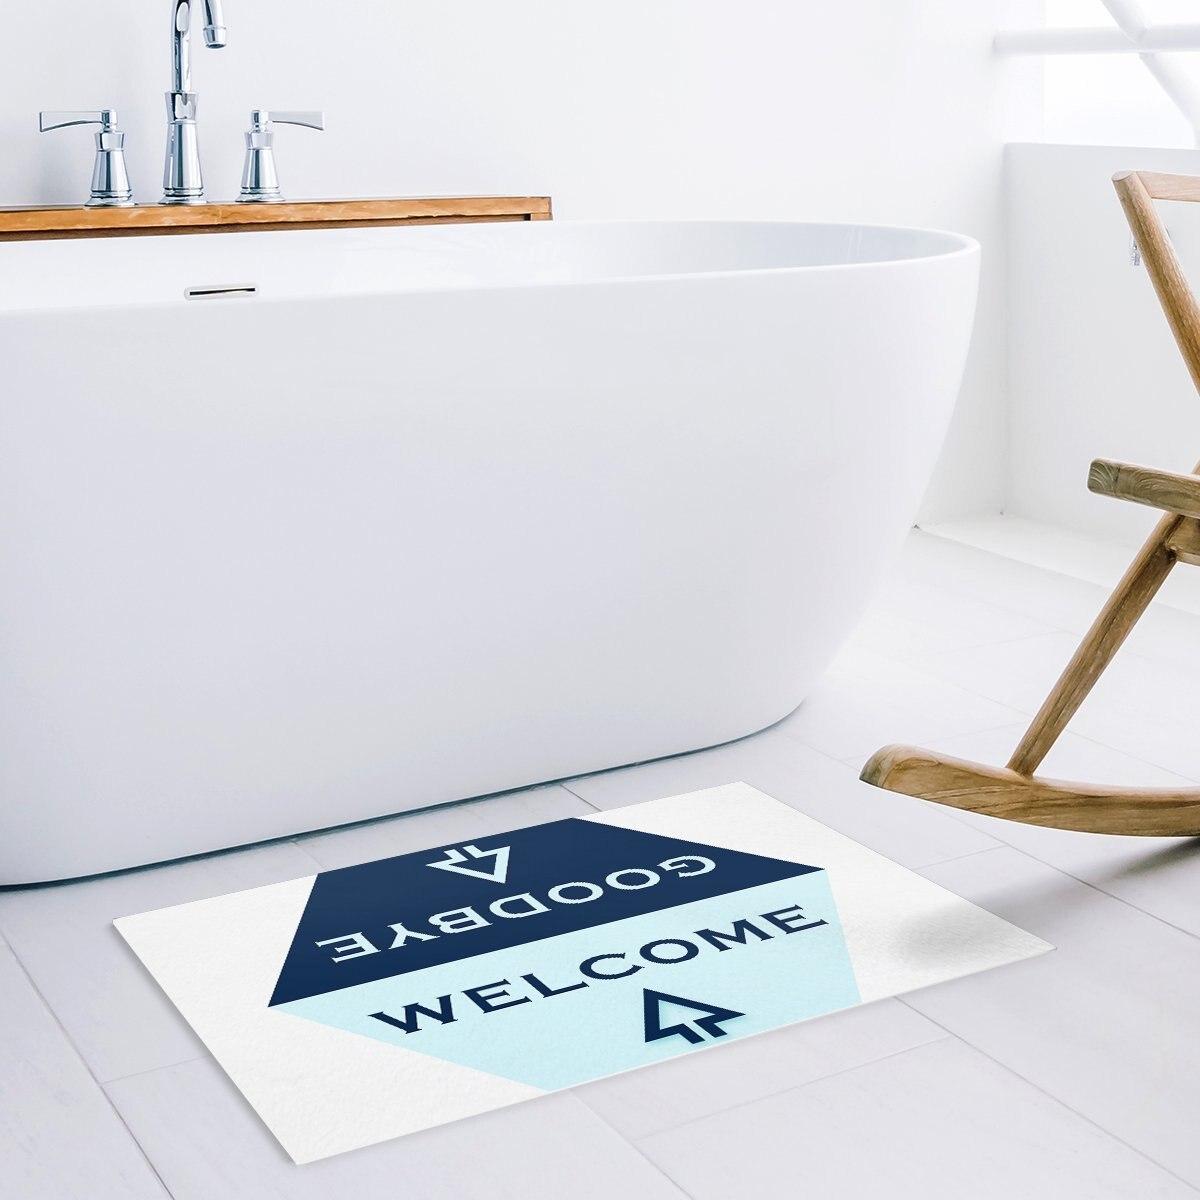 Light Blue And Navy Blue Hexagon Arrow Welcome Goodbye Greetings Pattern Symmetry Door Mats Kitchen Floor Bath Entrance Rug Mat